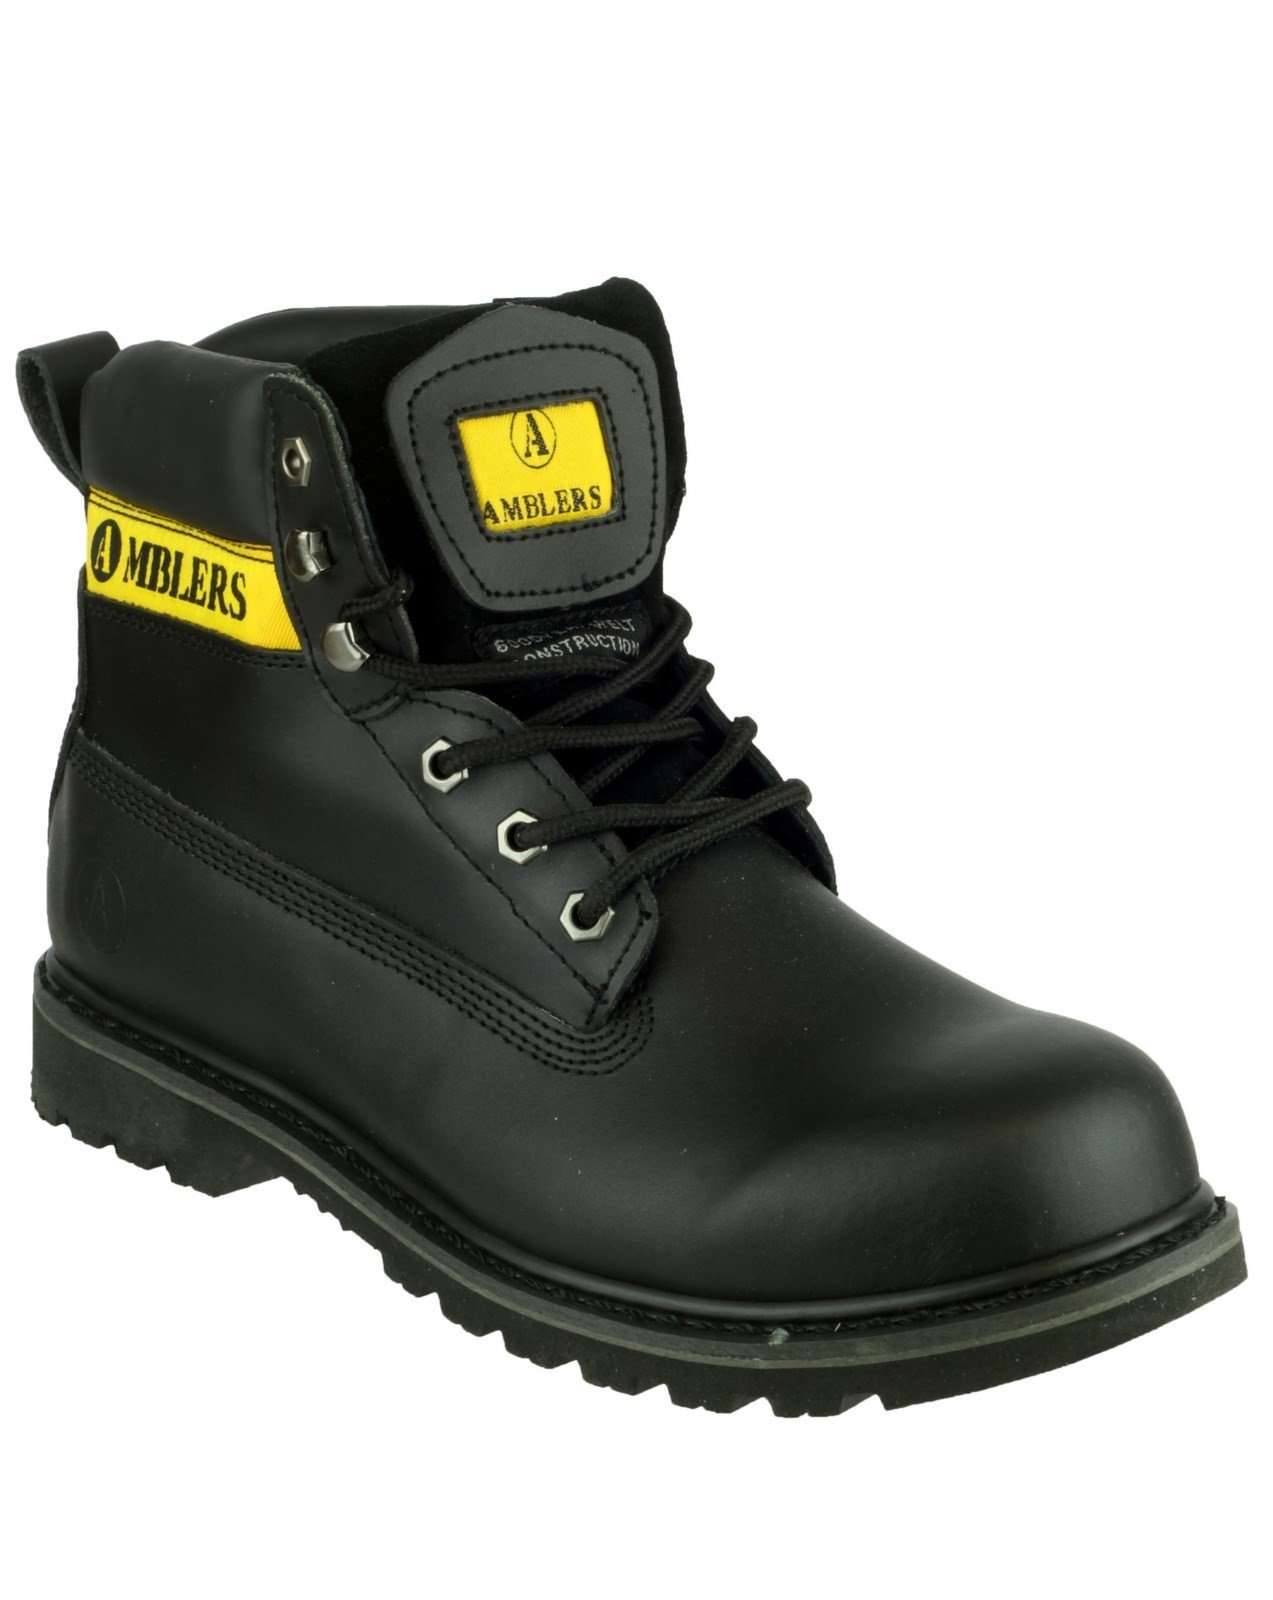 Amblers Women's Banbury Casual Boot Black 19517 - Black 6